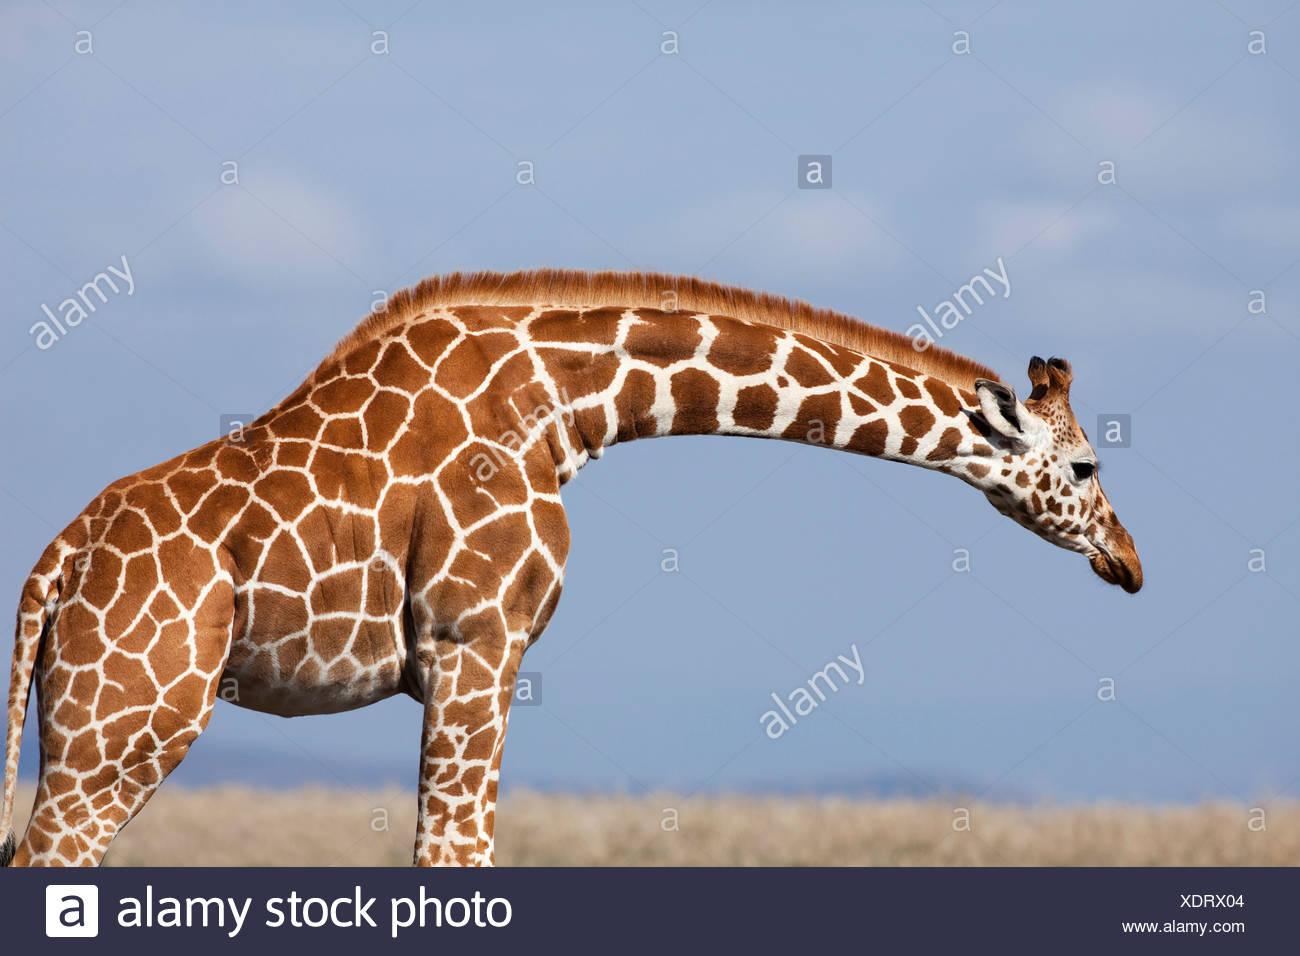 Reticulated Giraffe (Giraffa camelopardalis reticulata) against dramatic sky, Ol Pejeta Conservancy, Rift Valley Province, Kenya Stock Photo